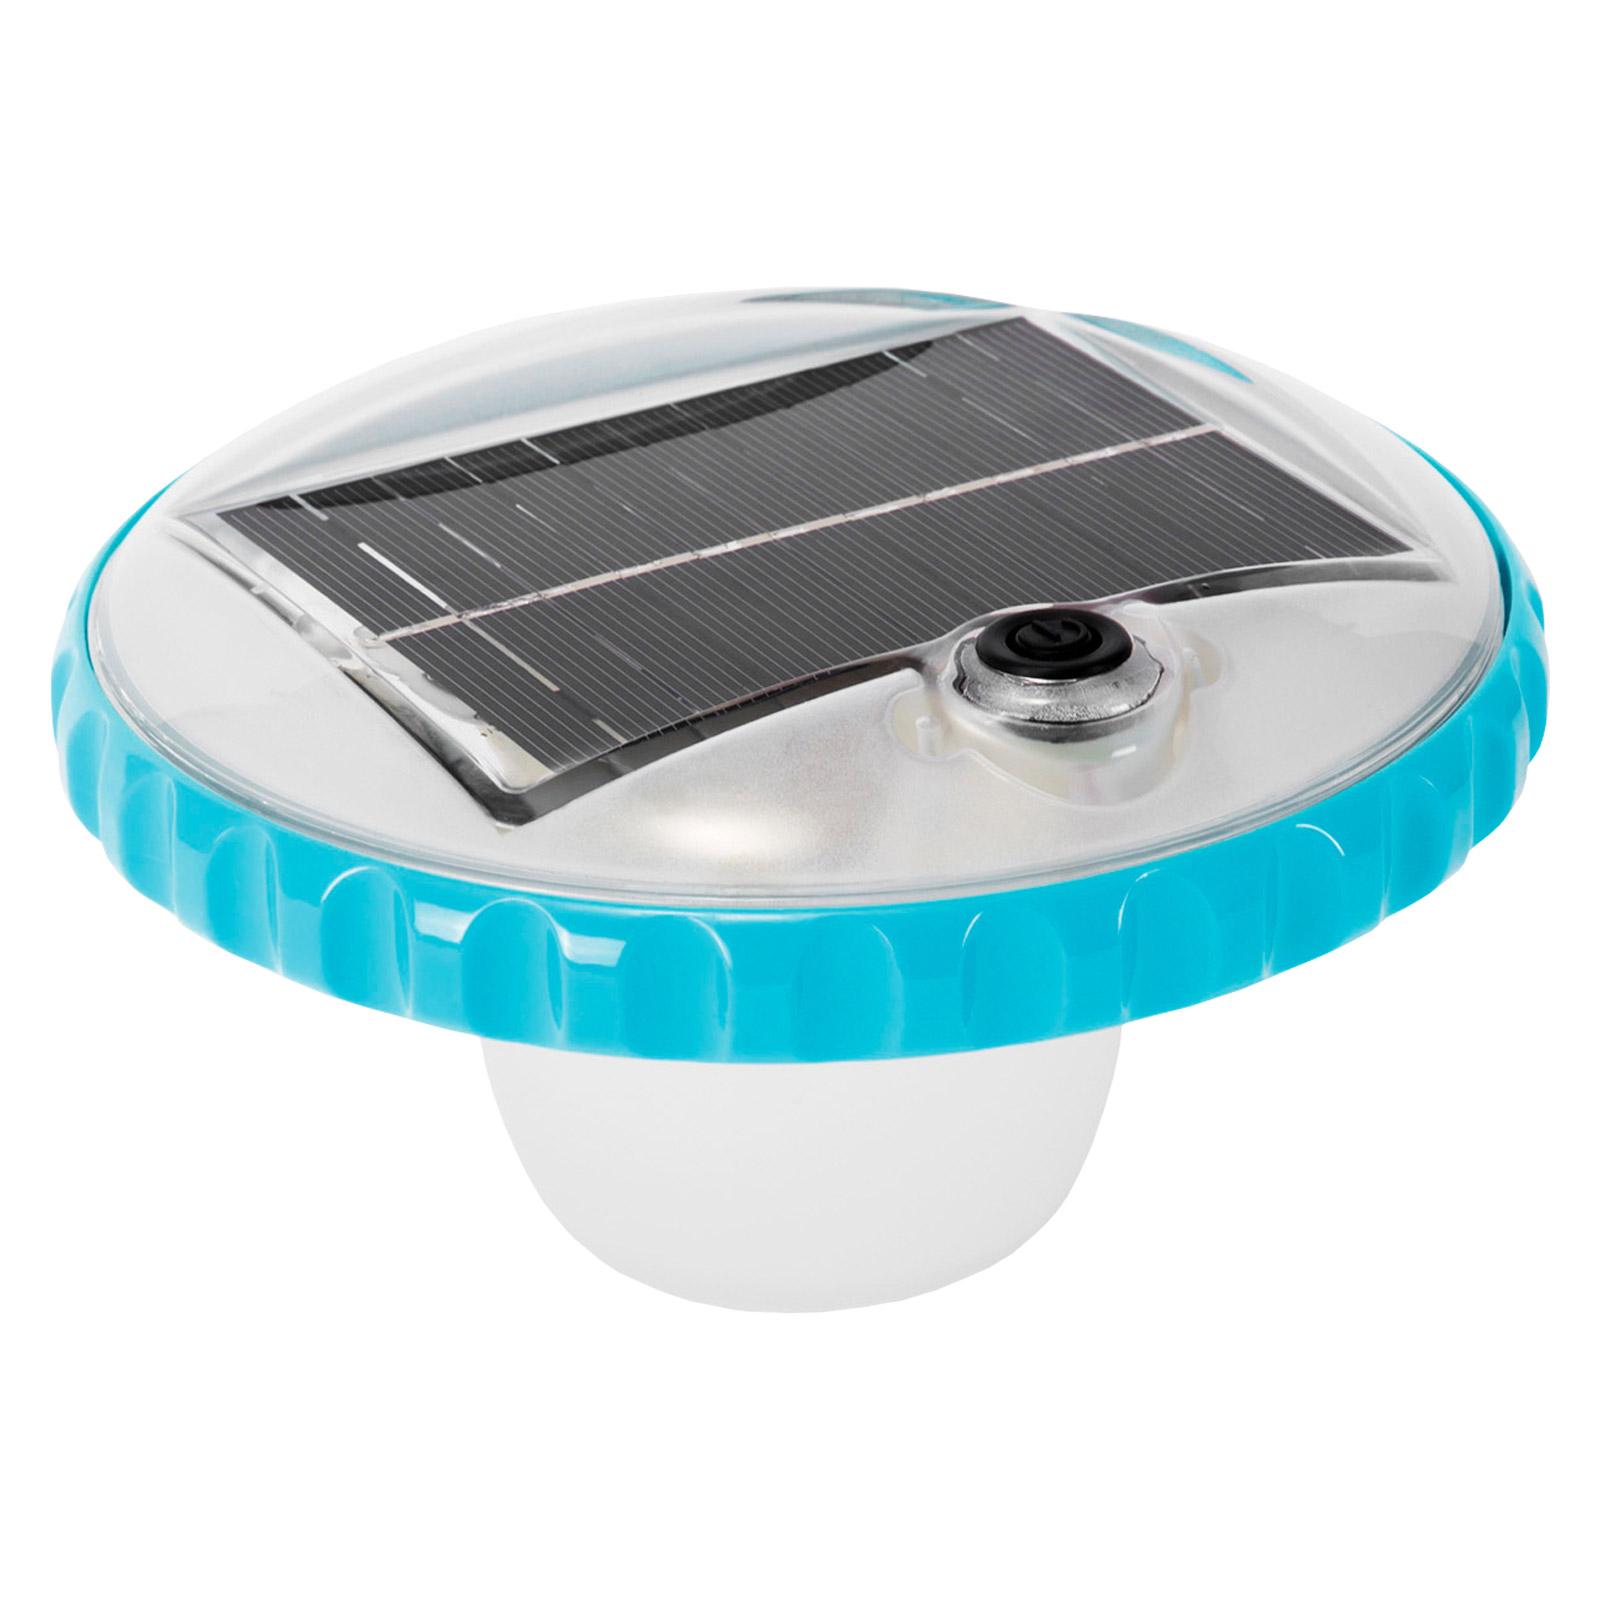 Intex Pool LED 28695 Poollicht Solar Powered LED Floating Light